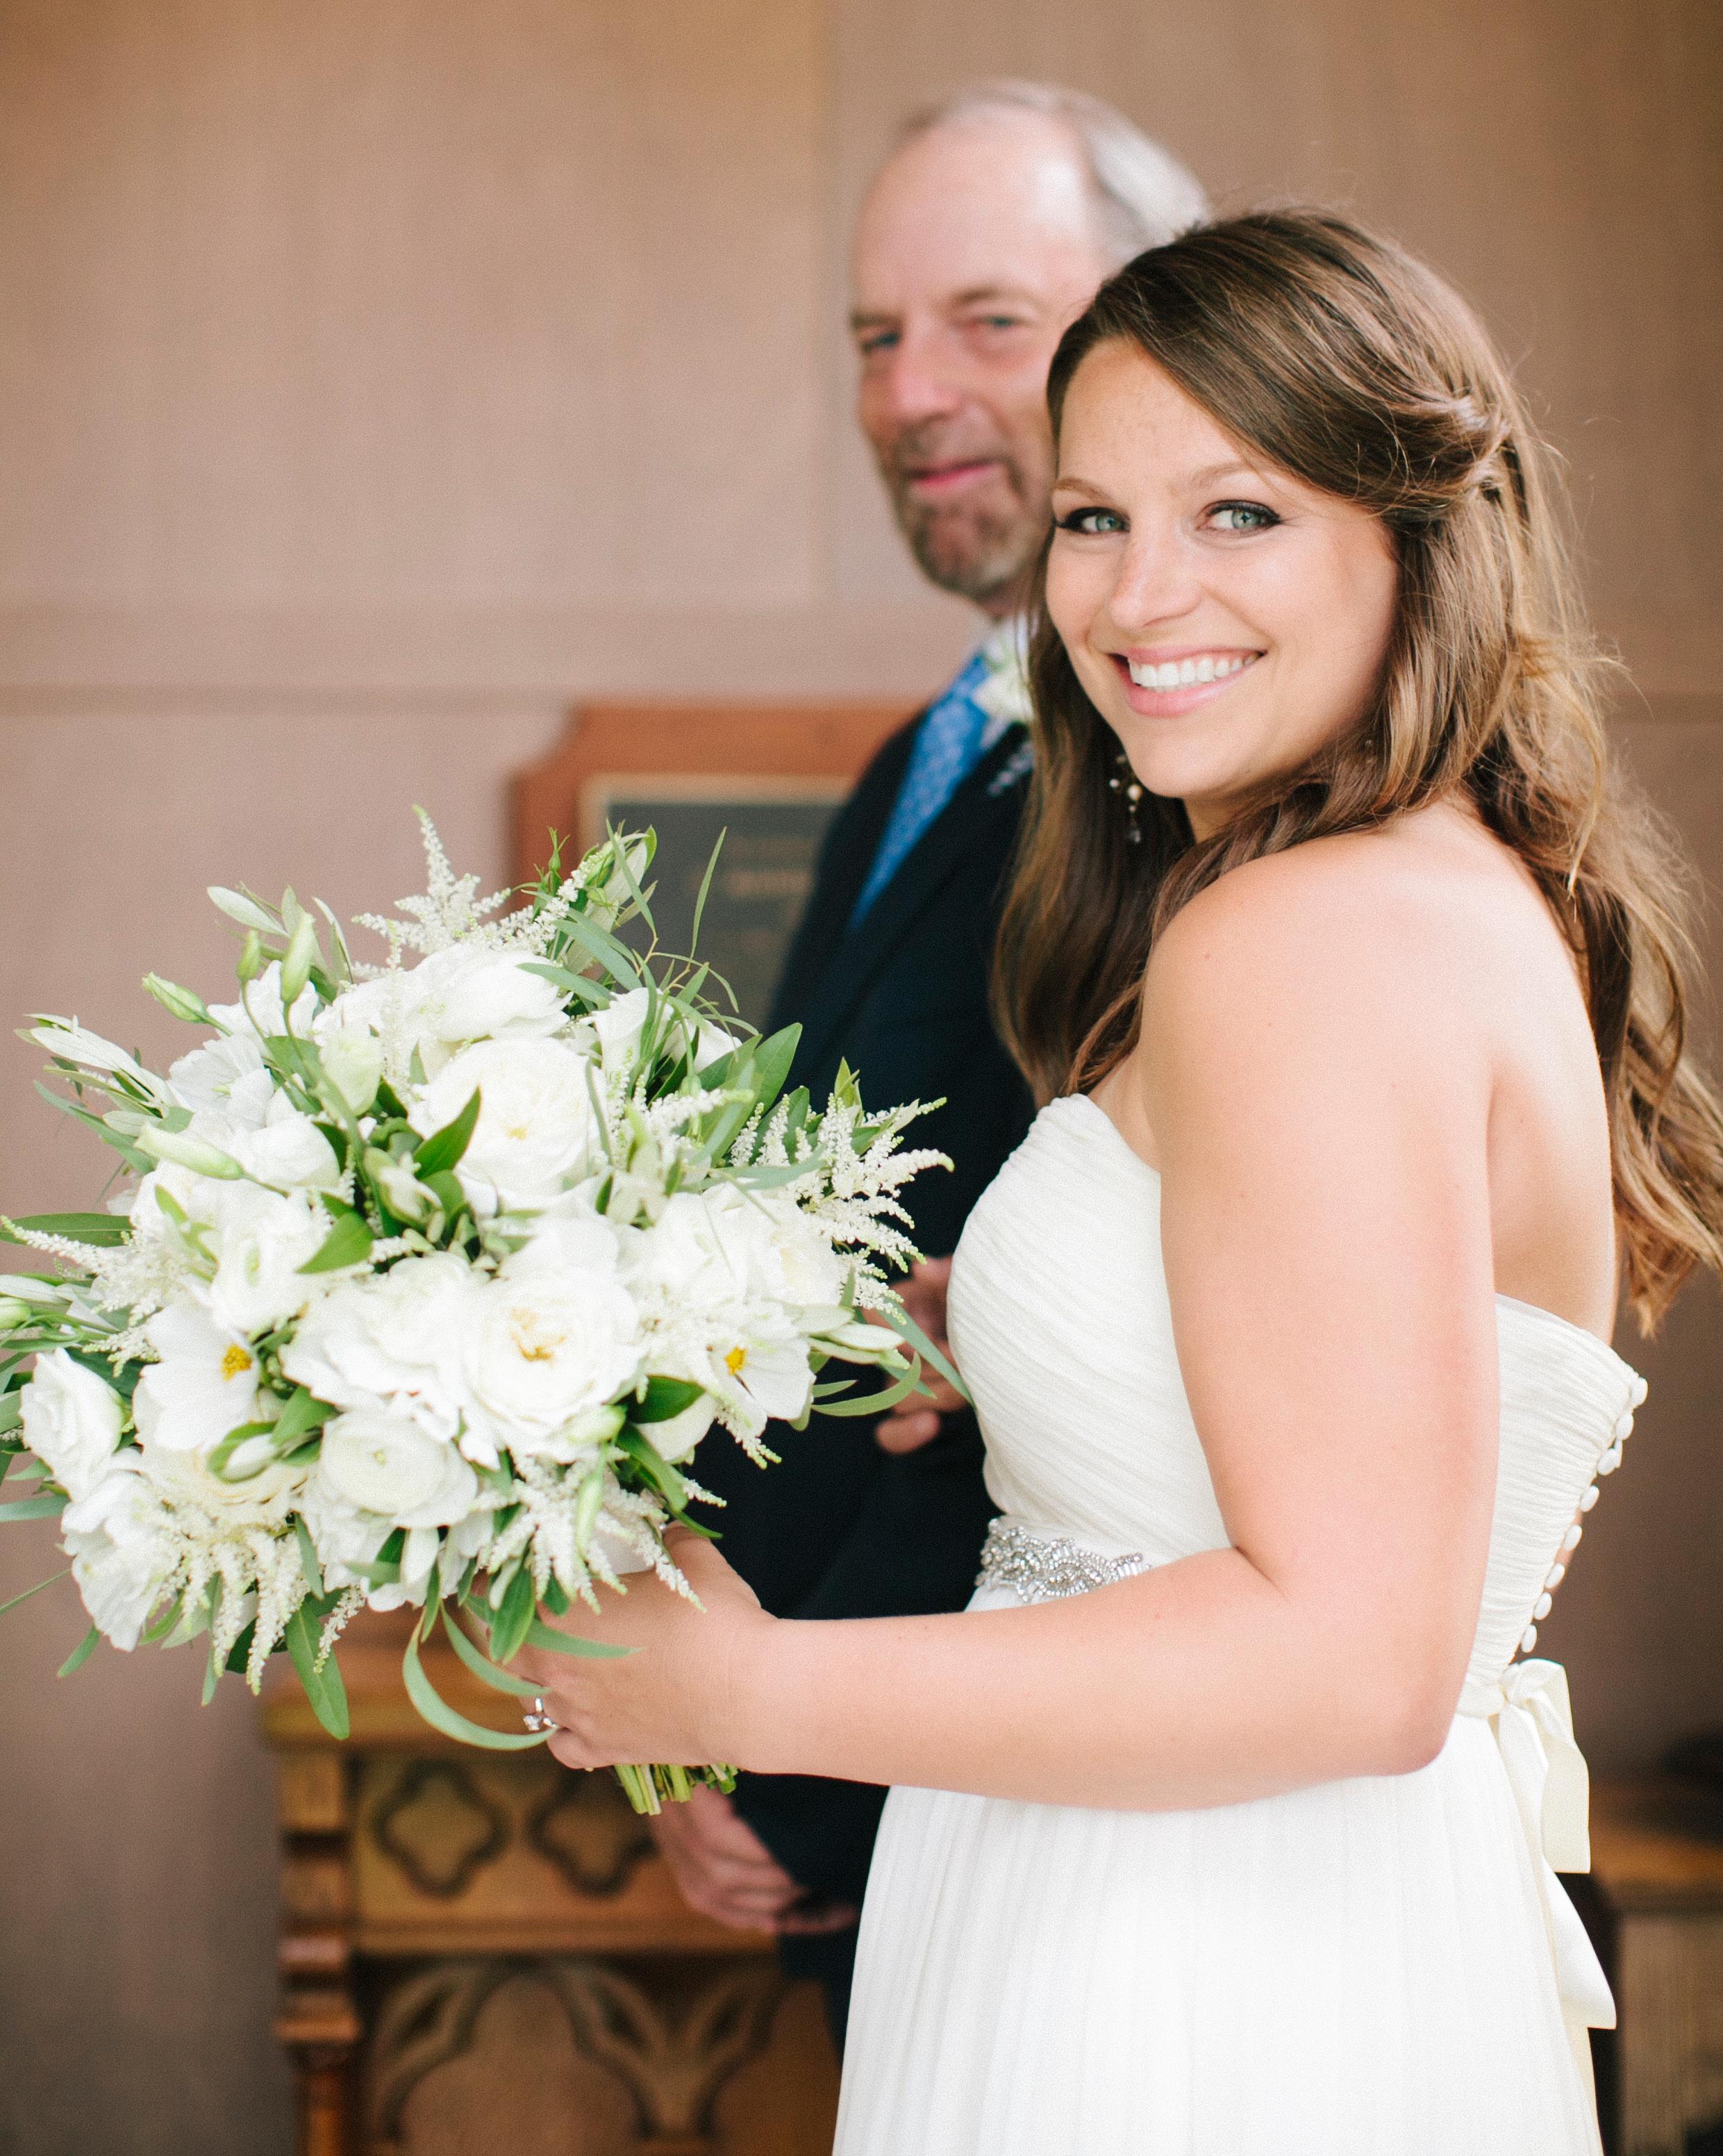 kristen-jonathan-wedding-dad-0309-s112193-1015.jpg